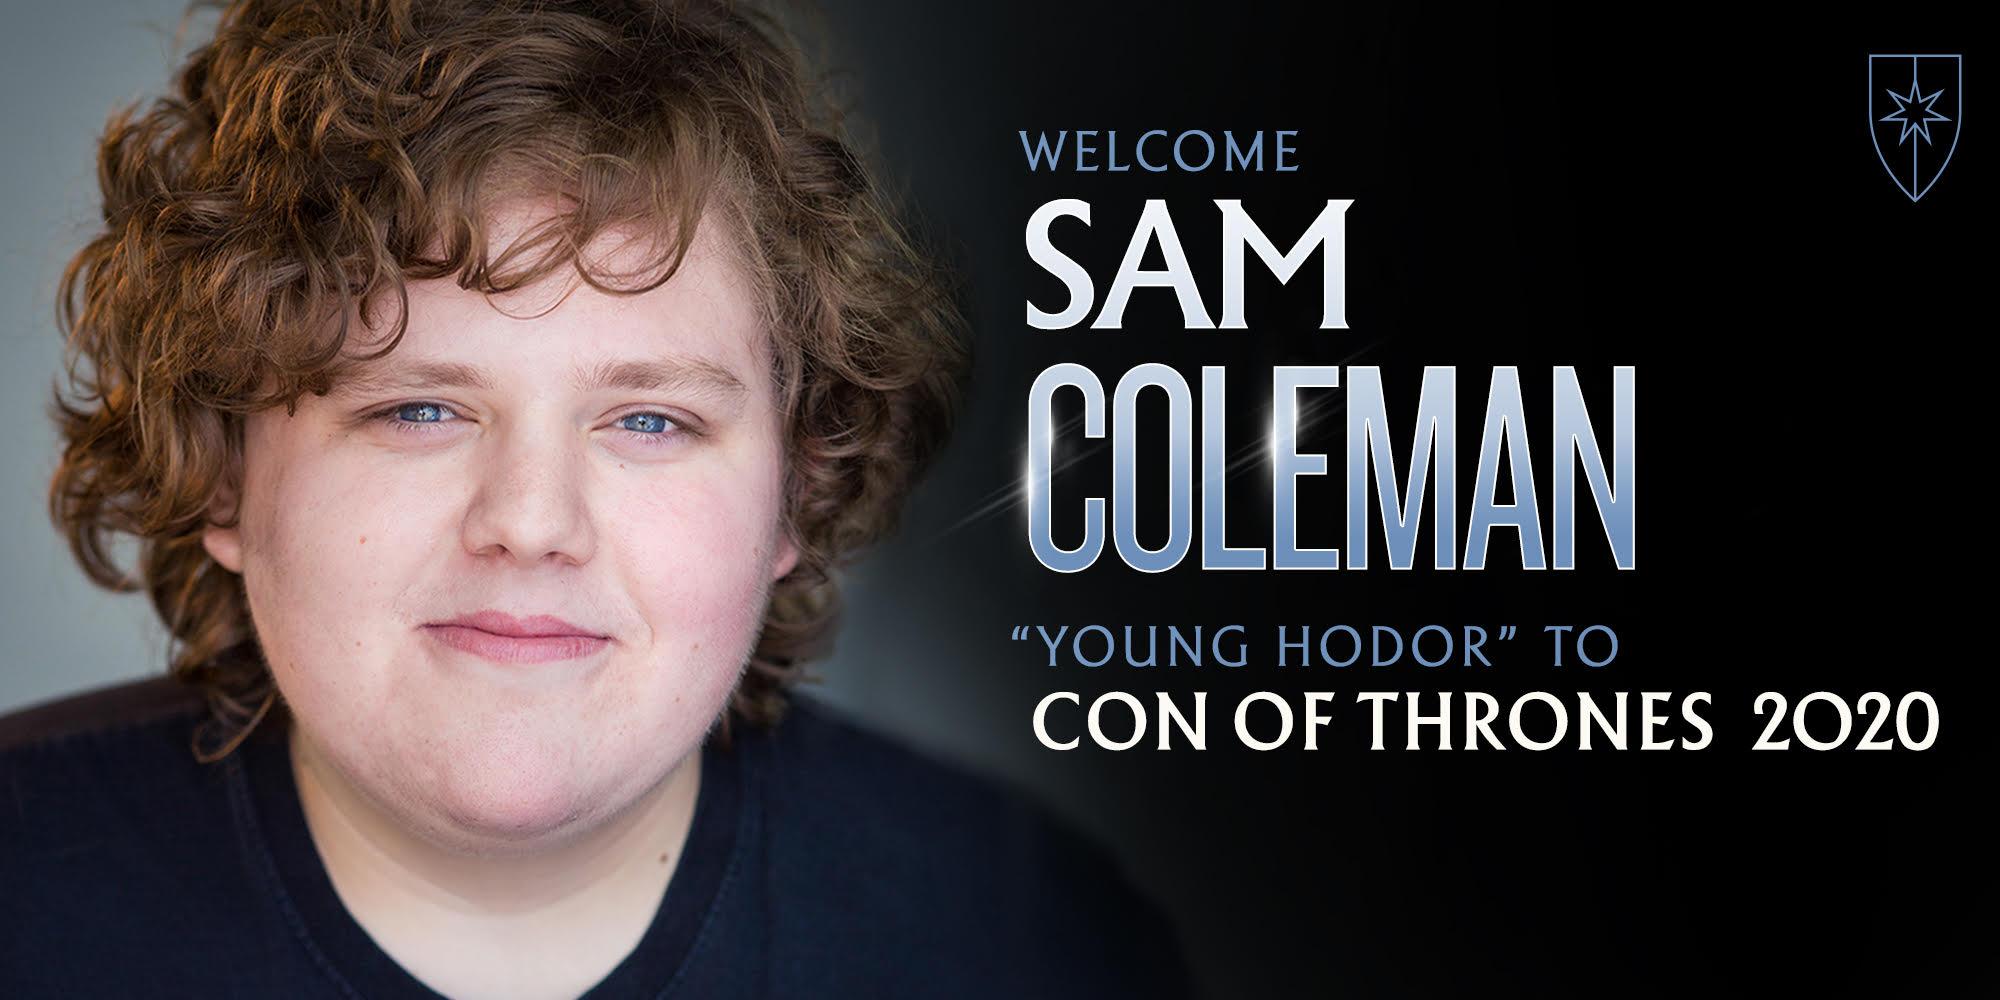 Sam Coleman